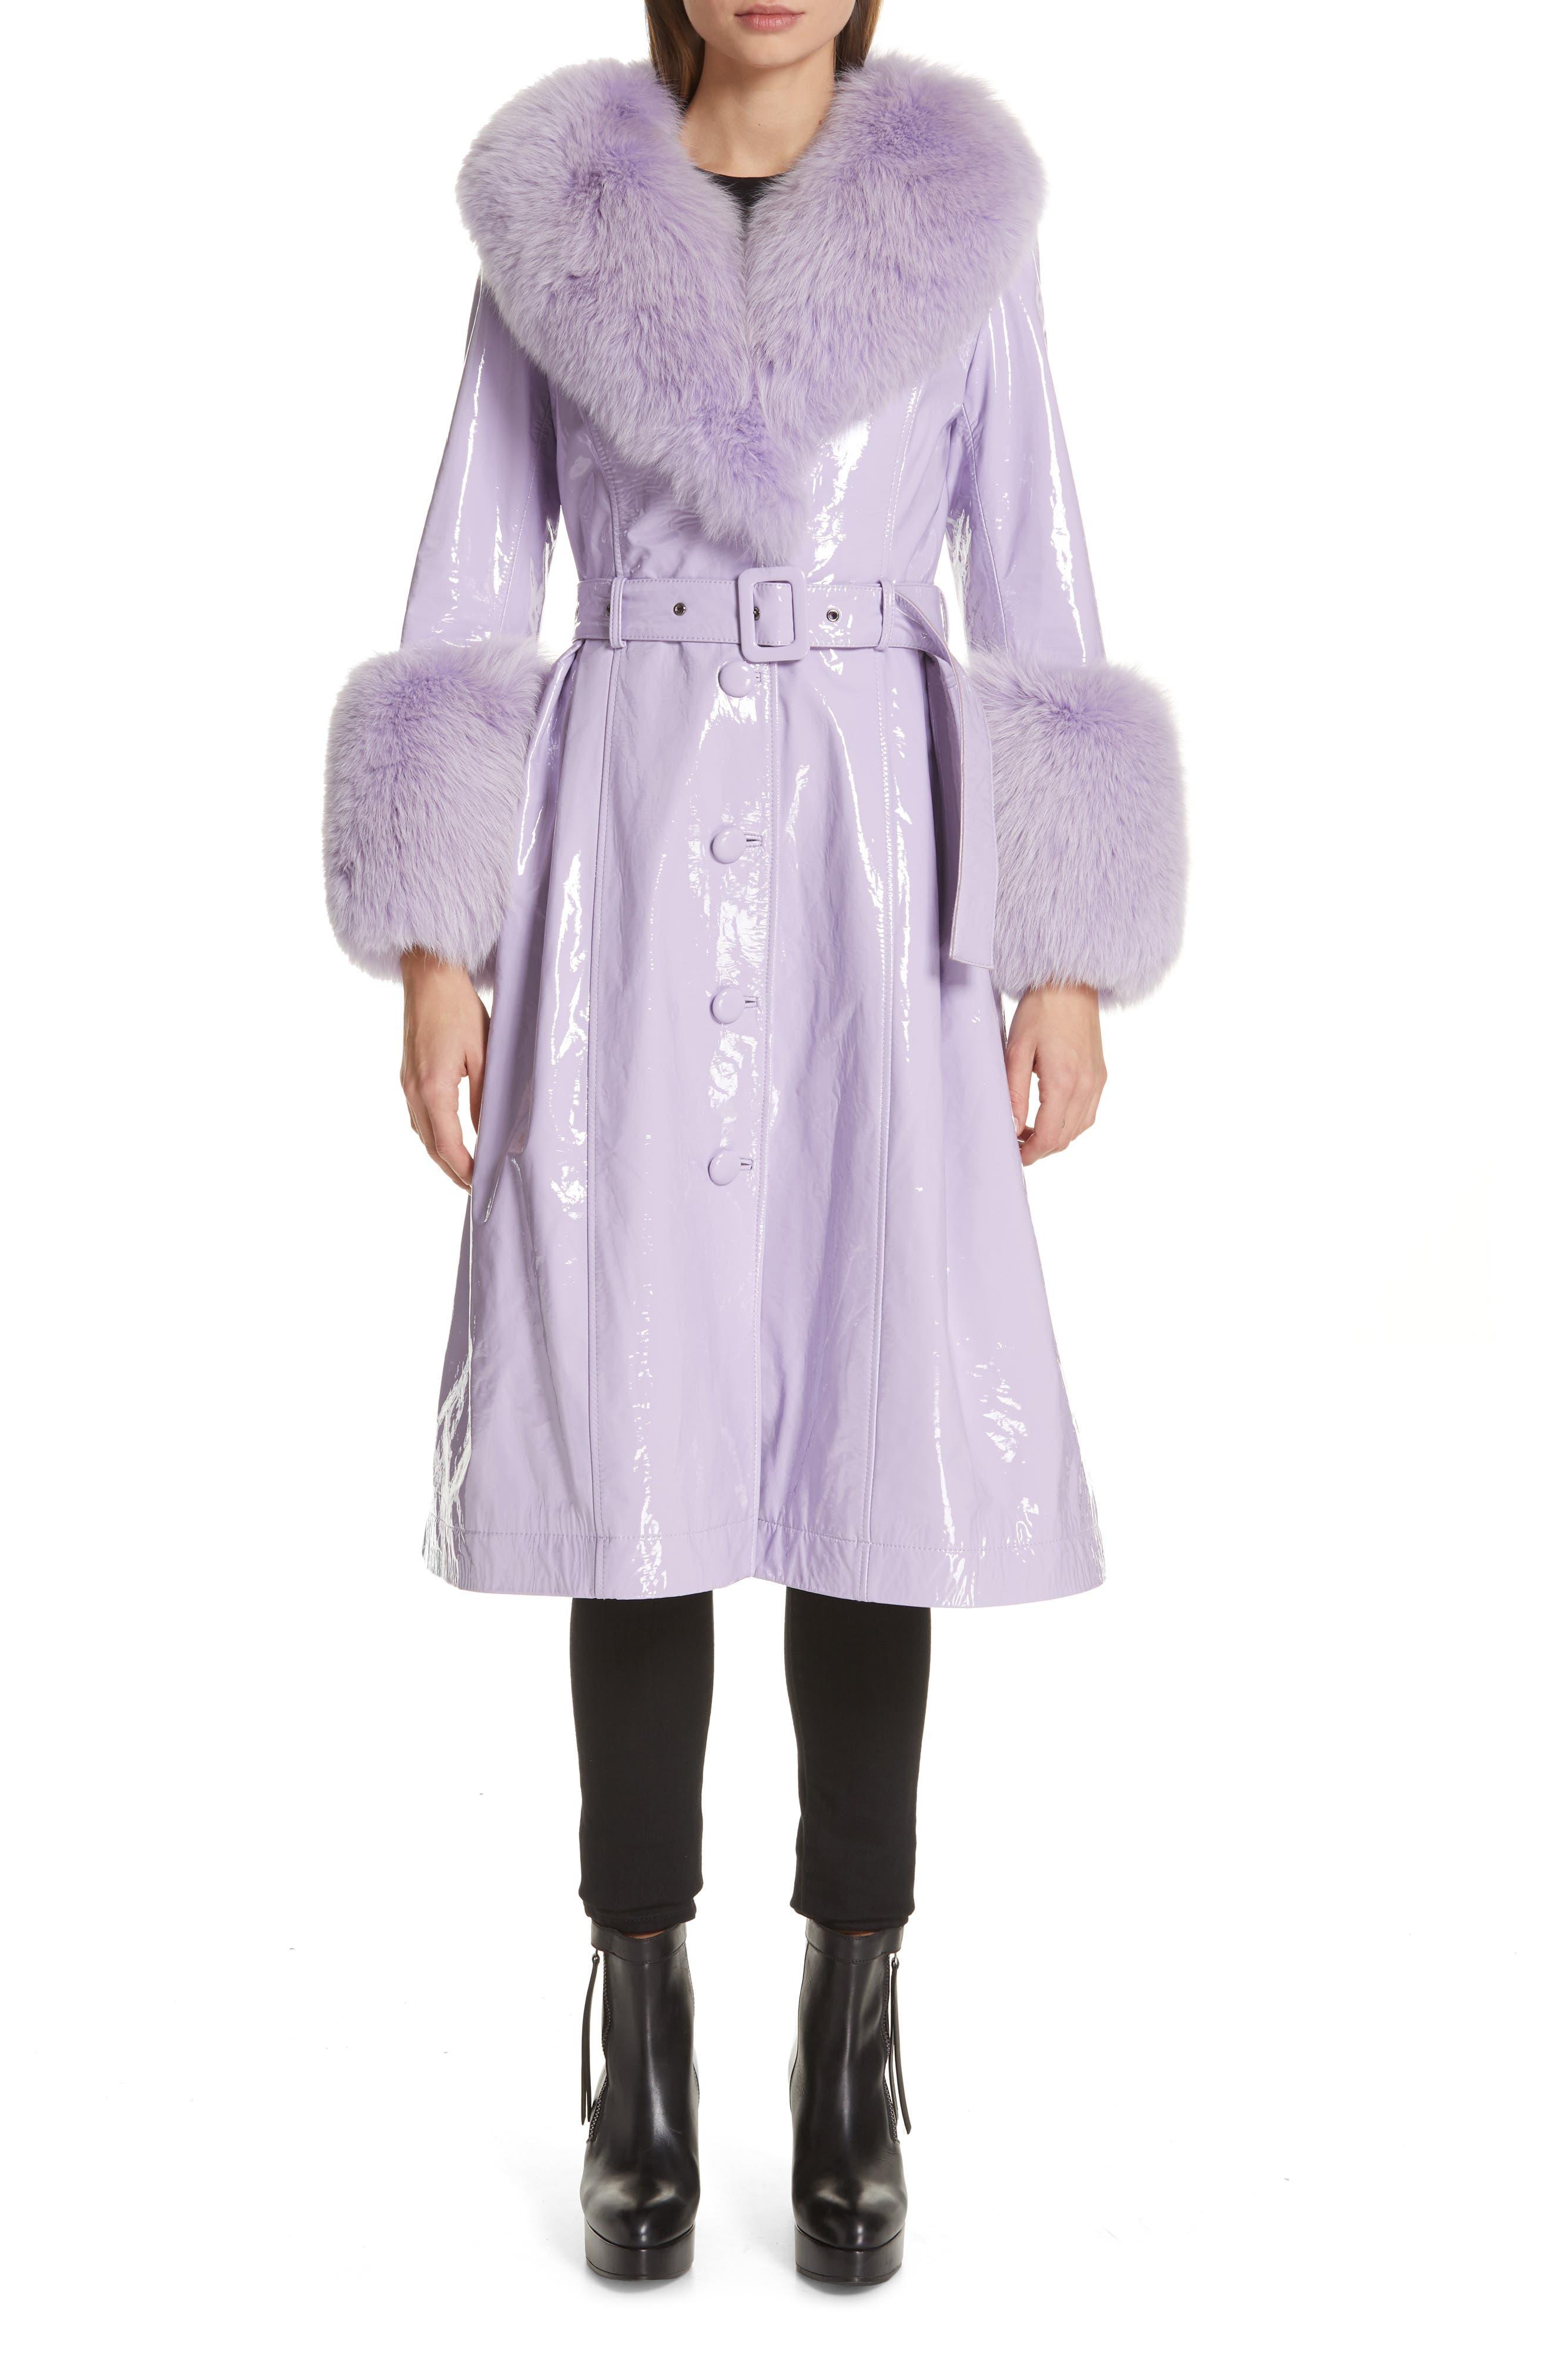 SAKS POTTS, Patent Leather Coat with Genuine Fox Fur Trim, Main thumbnail 1, color, LAVENDER